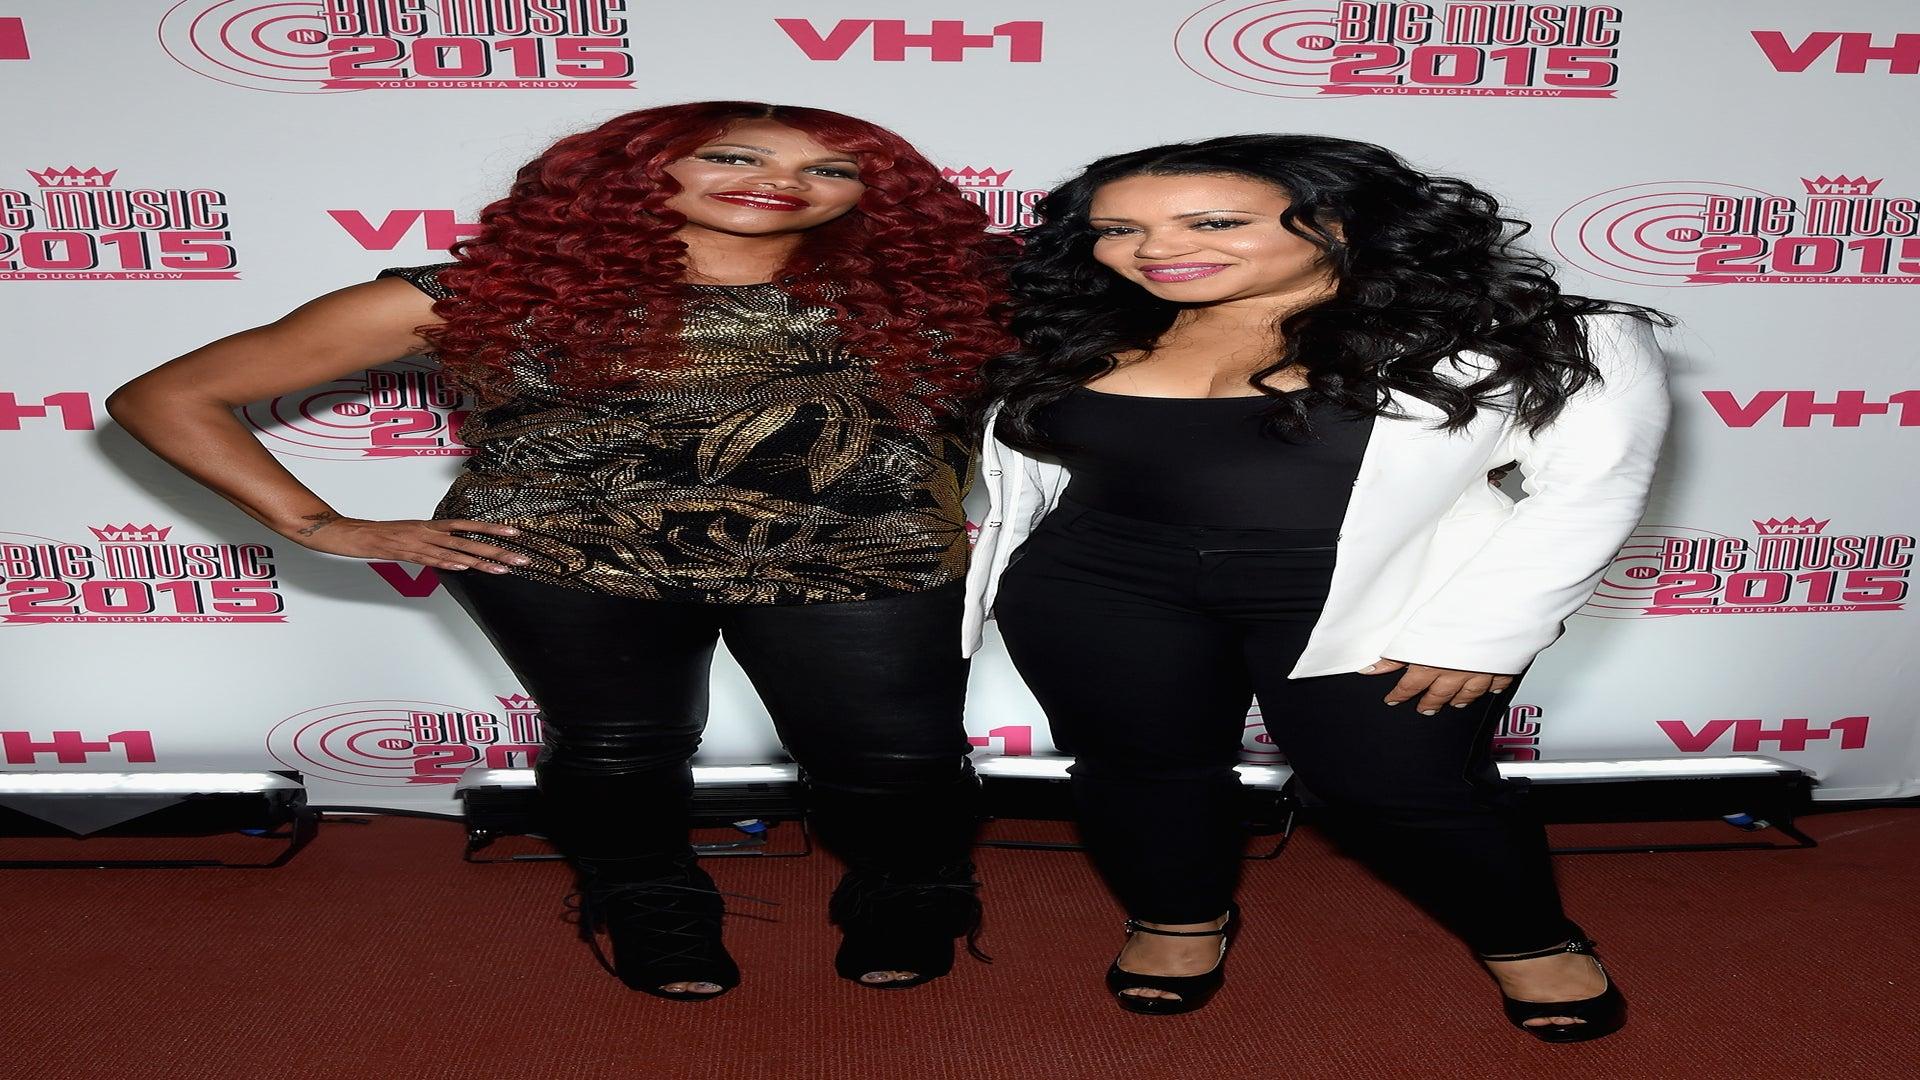 Salt-N-Pepa Say 'Baton Has Been Dropped' for Female MCs